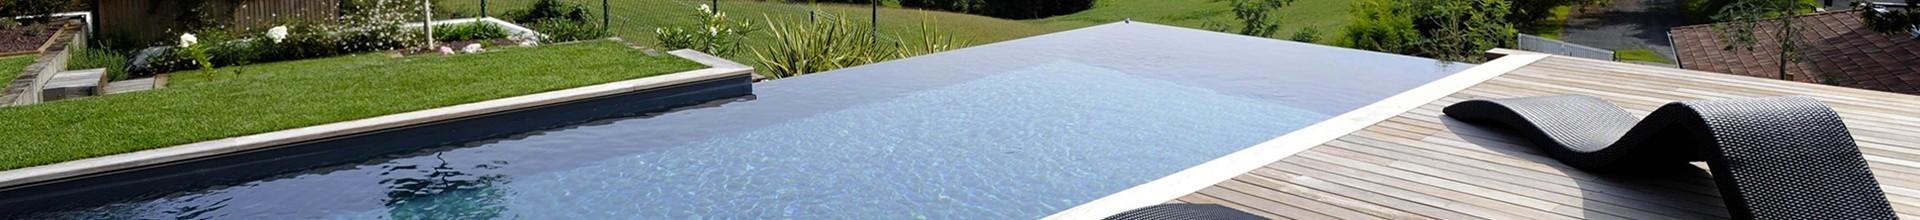 Constructeur piscine discount Pays : Belgique